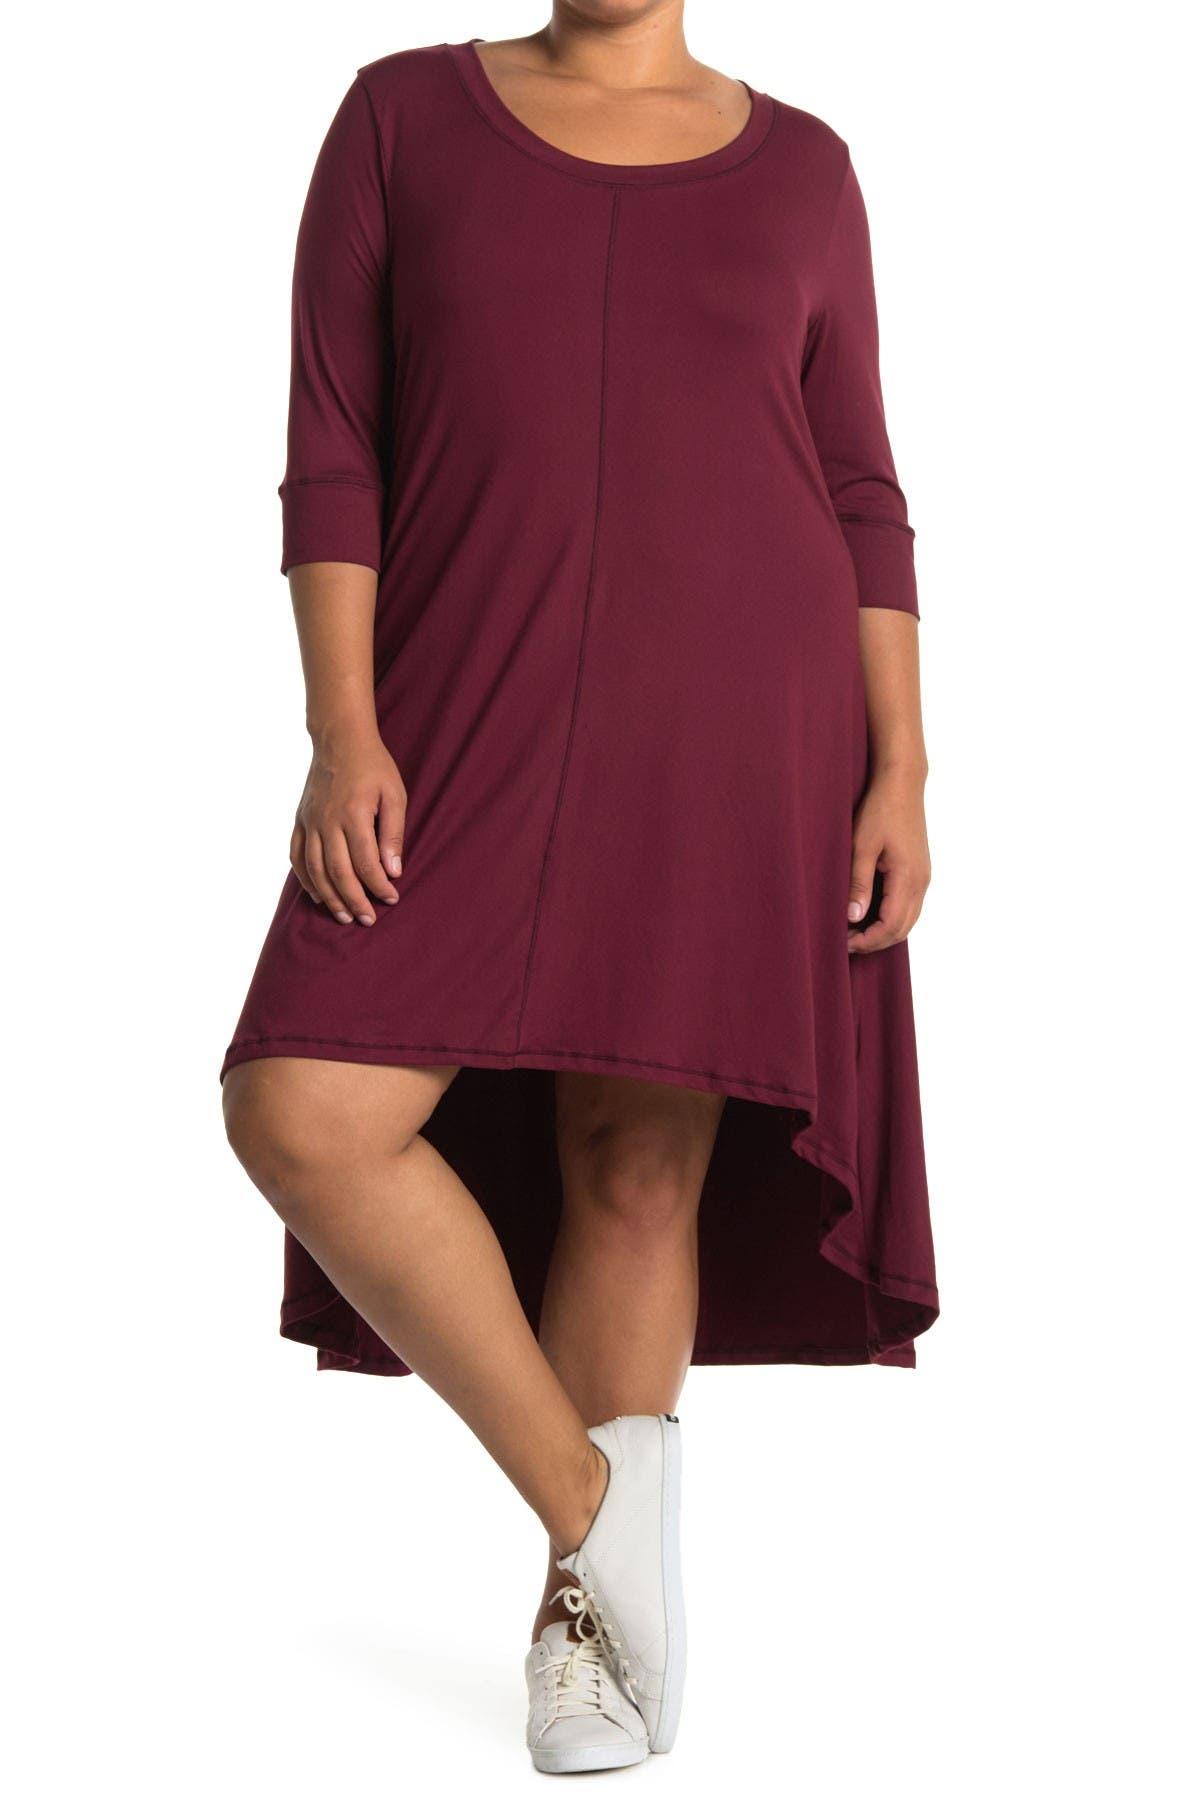 Forgotten Grace 3/4 Sleeve Hi-Lo Knit Dress at Nordstrom Rack